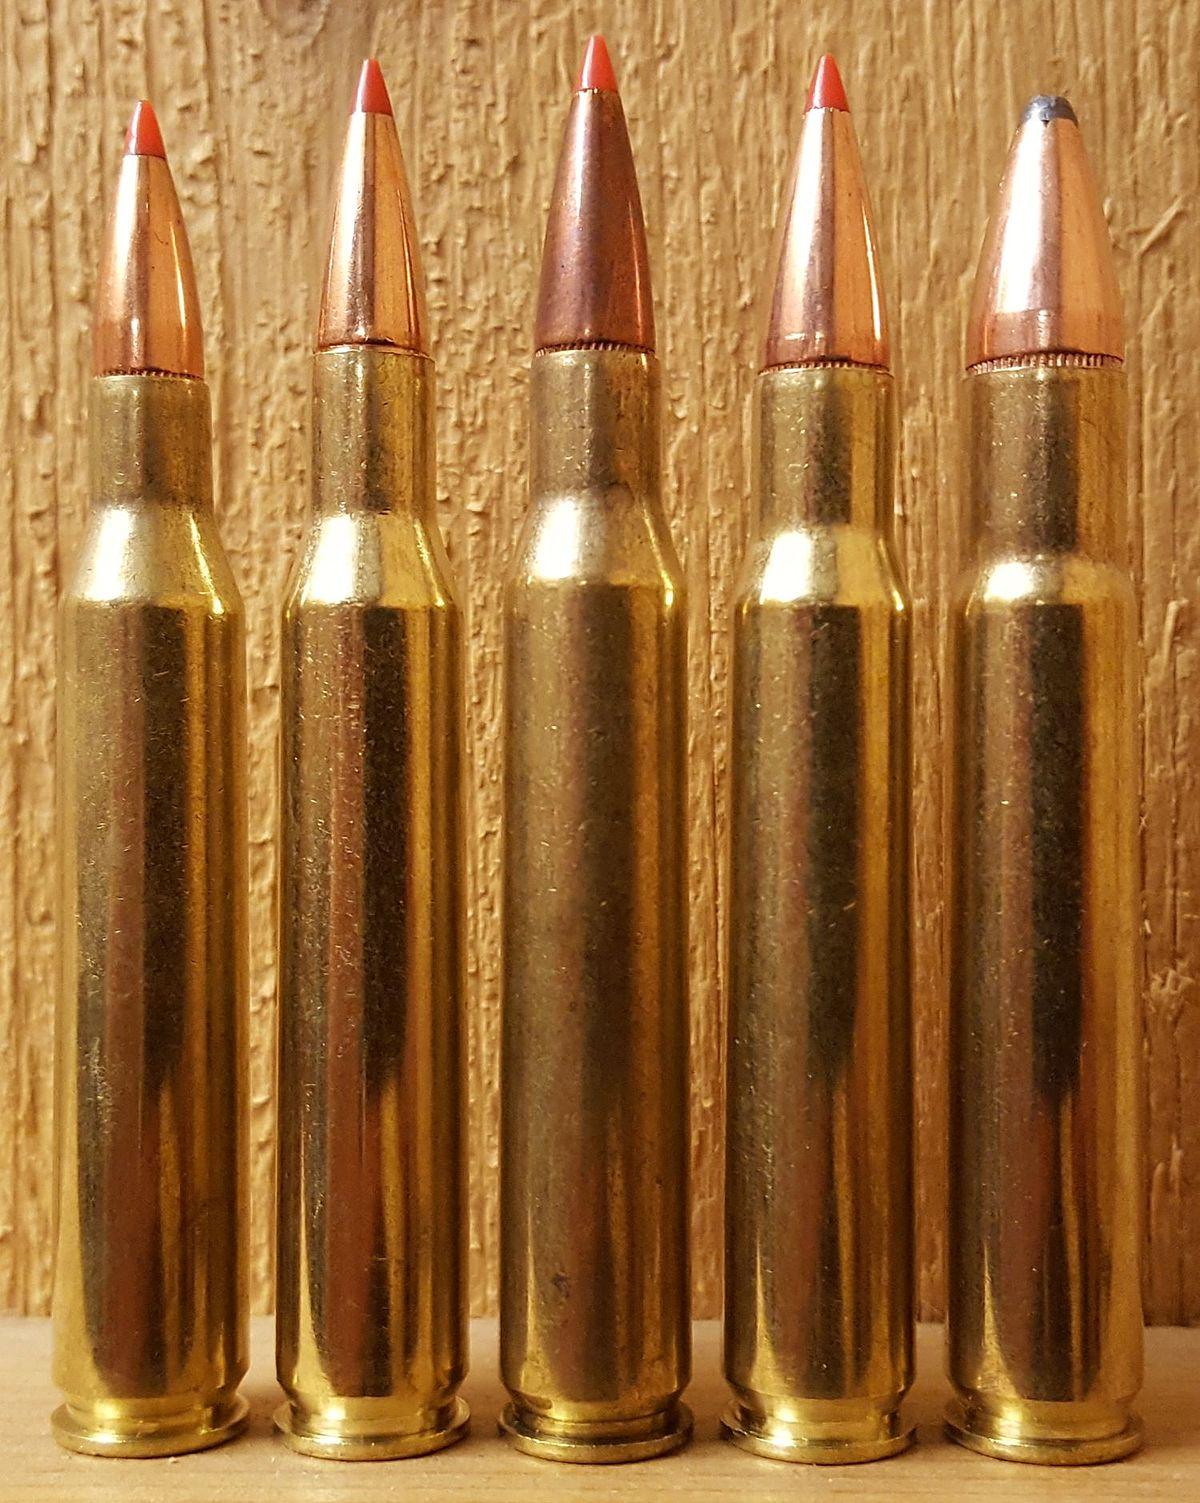 30-06 Springfield wildcat cartridges - Wikipedia